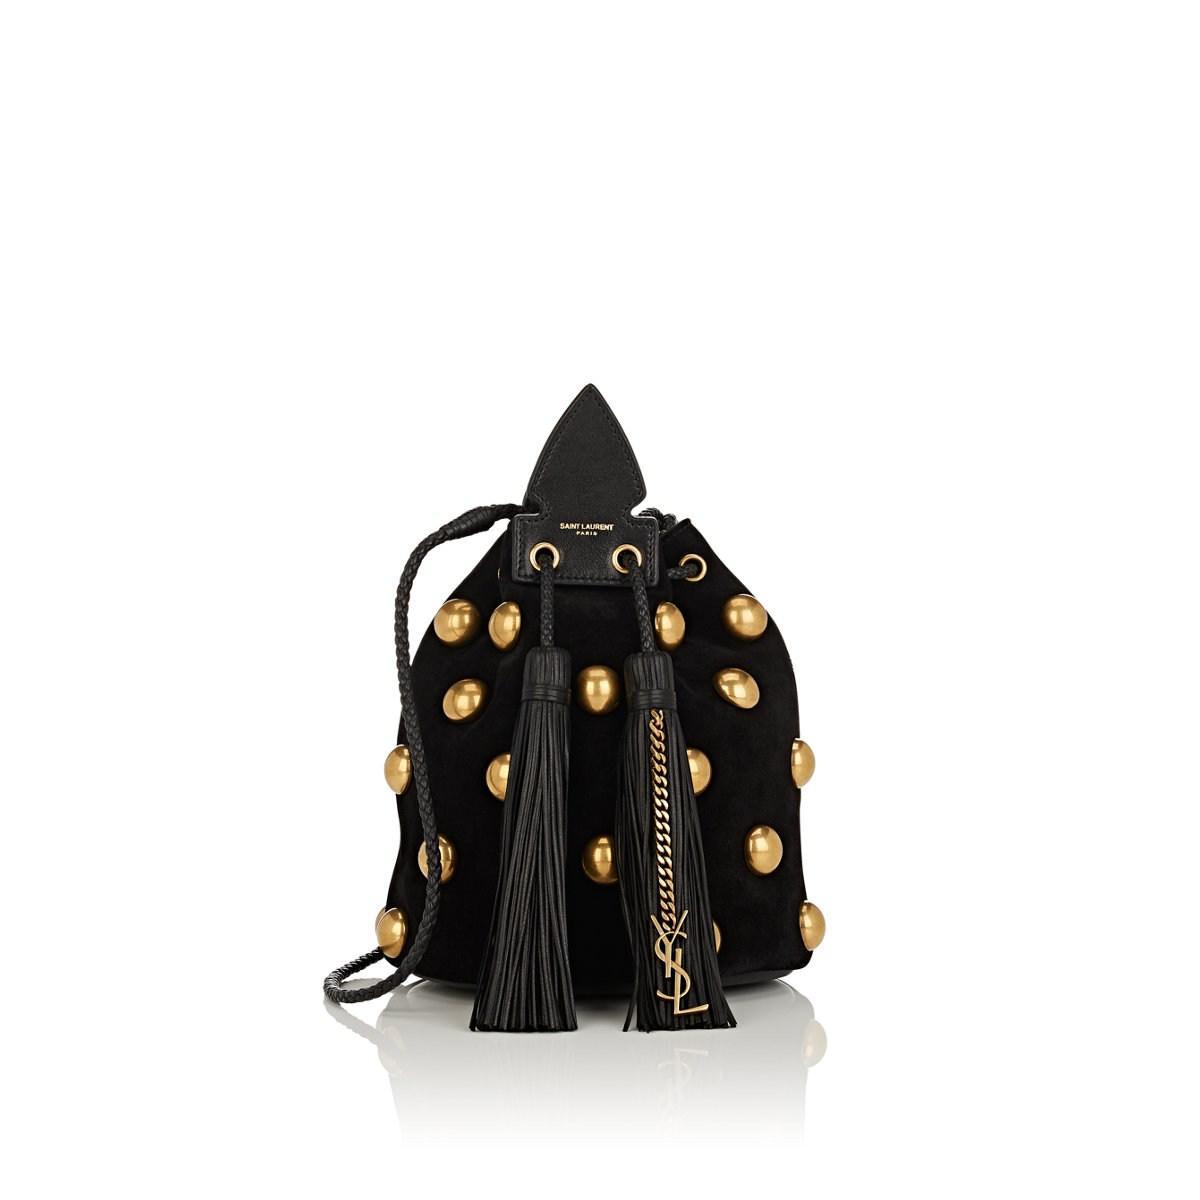 fbaa1f022ef2 Saint Laurent - Black Anja Small Suede Bucket Bag - Lyst. View fullscreen